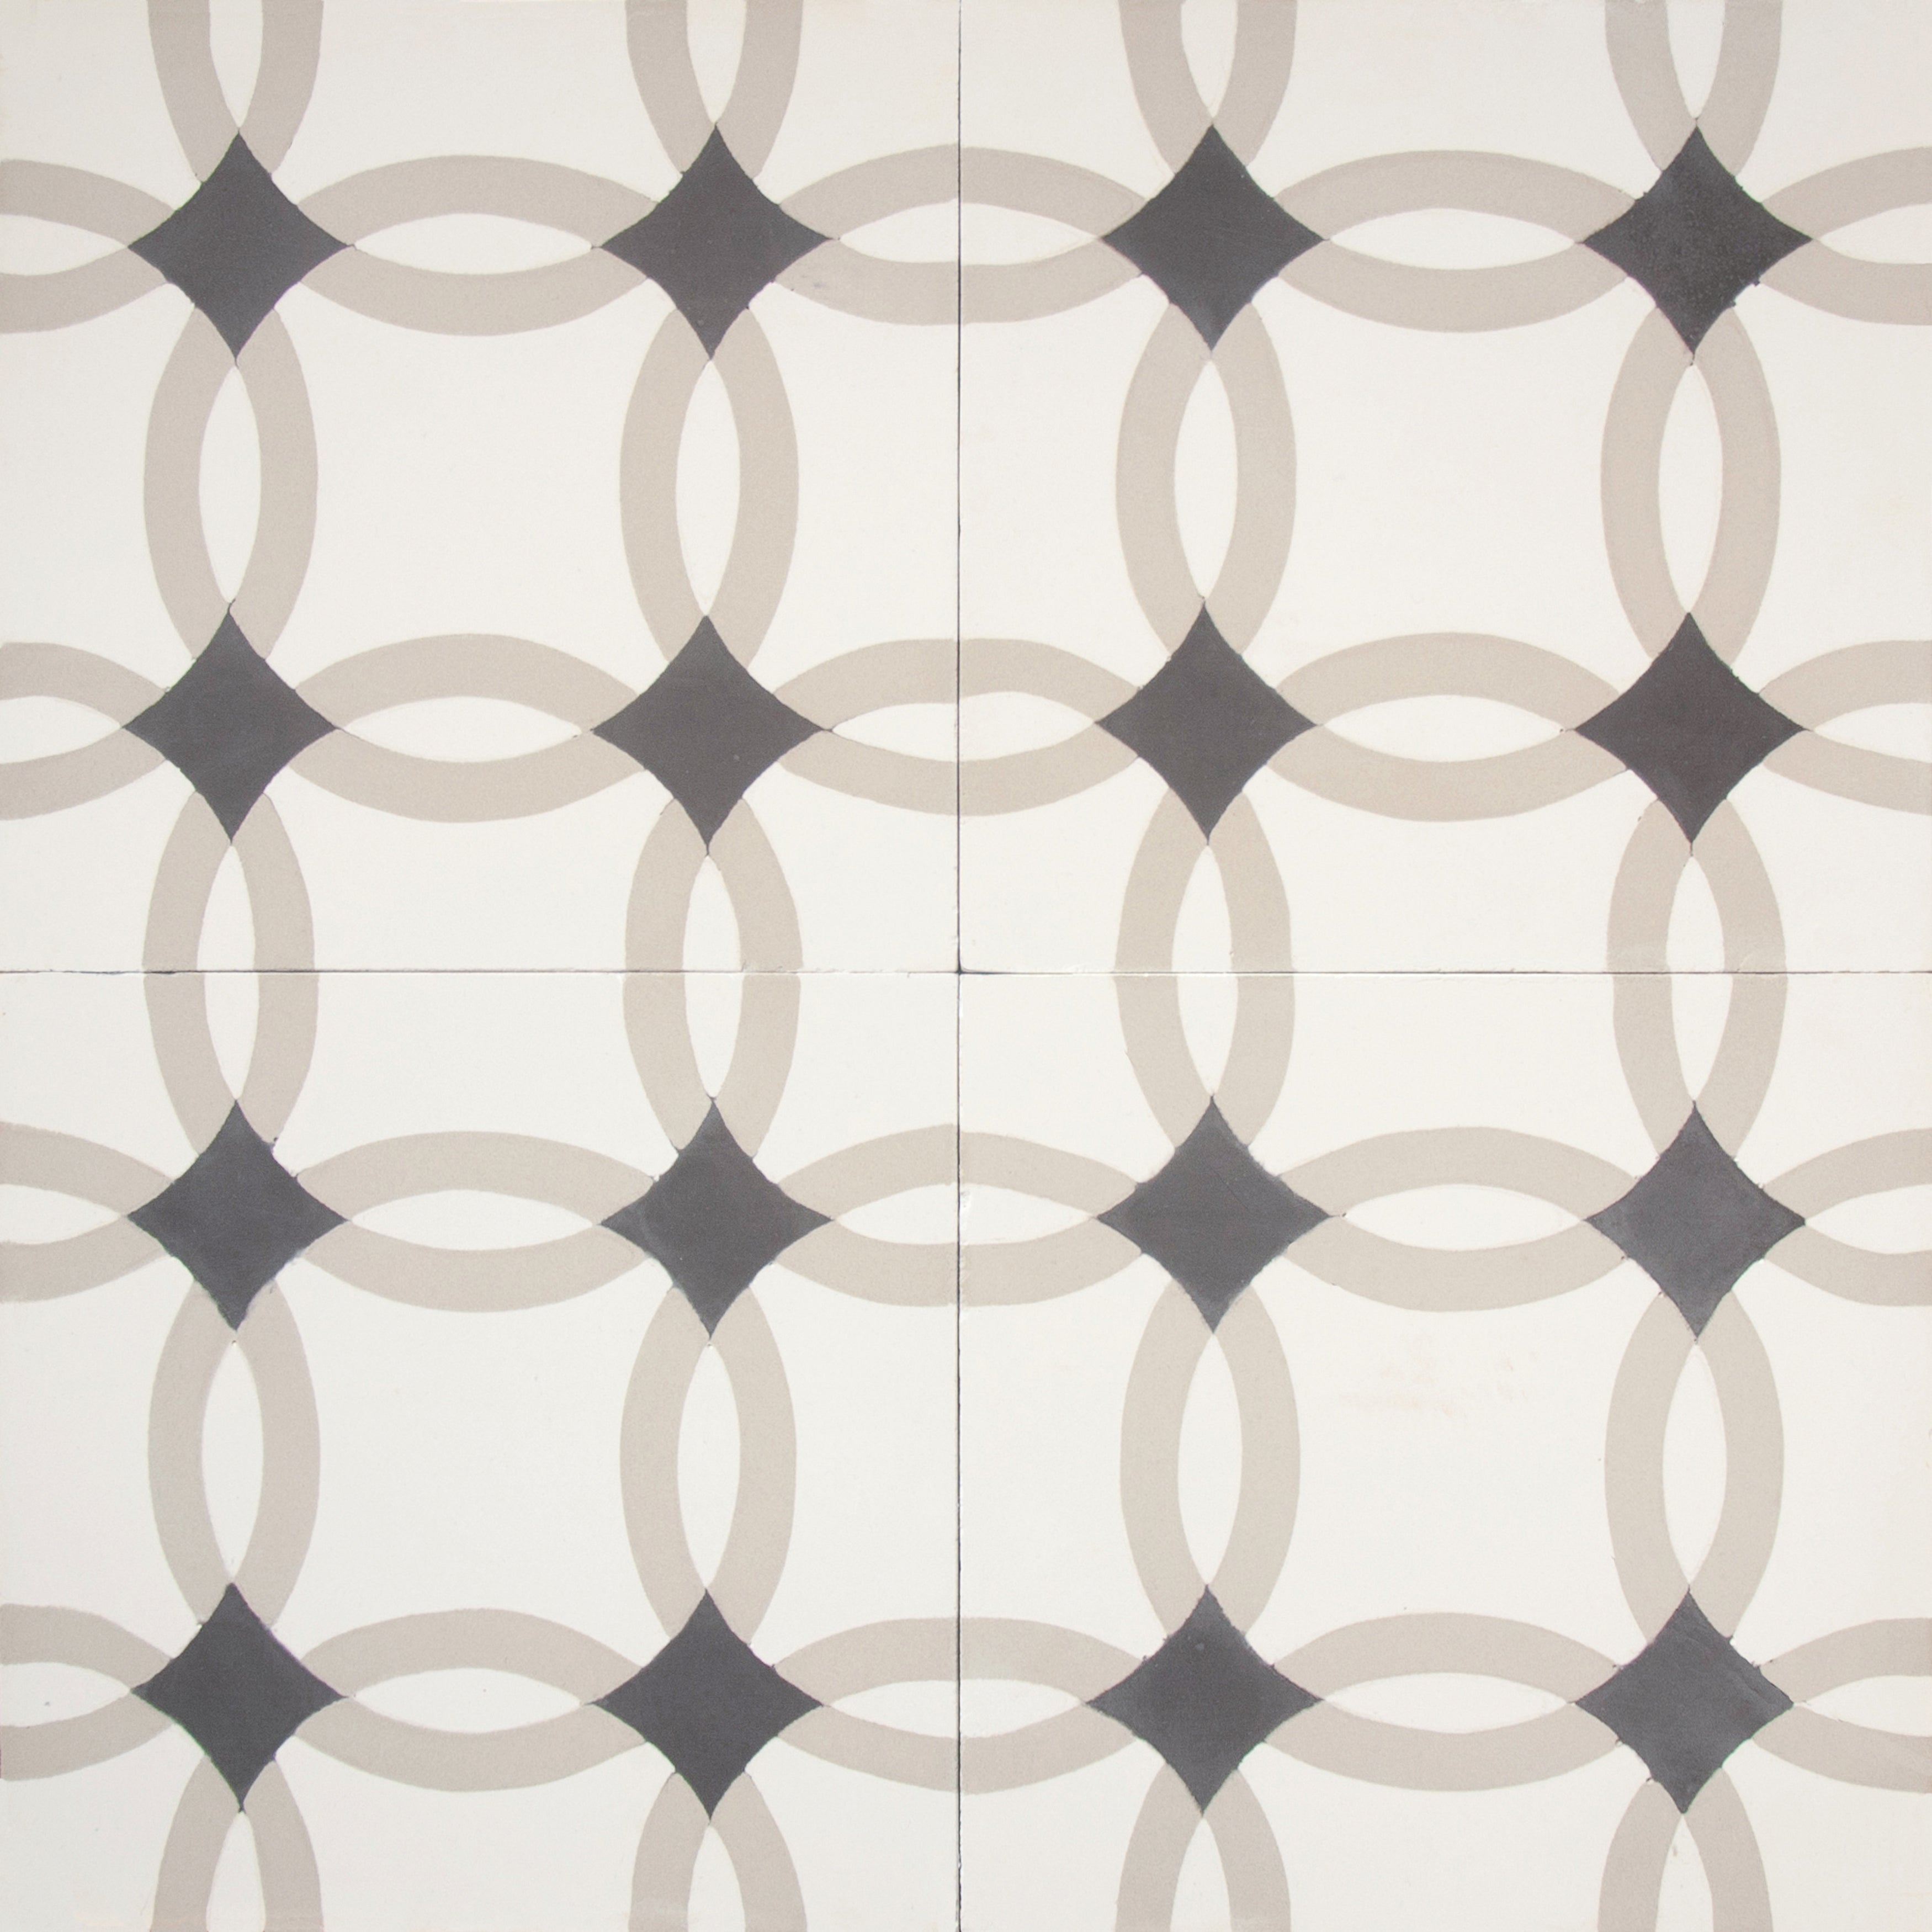 Granada Tile Echo Collection Athens Cement Tiles (Case of 50)